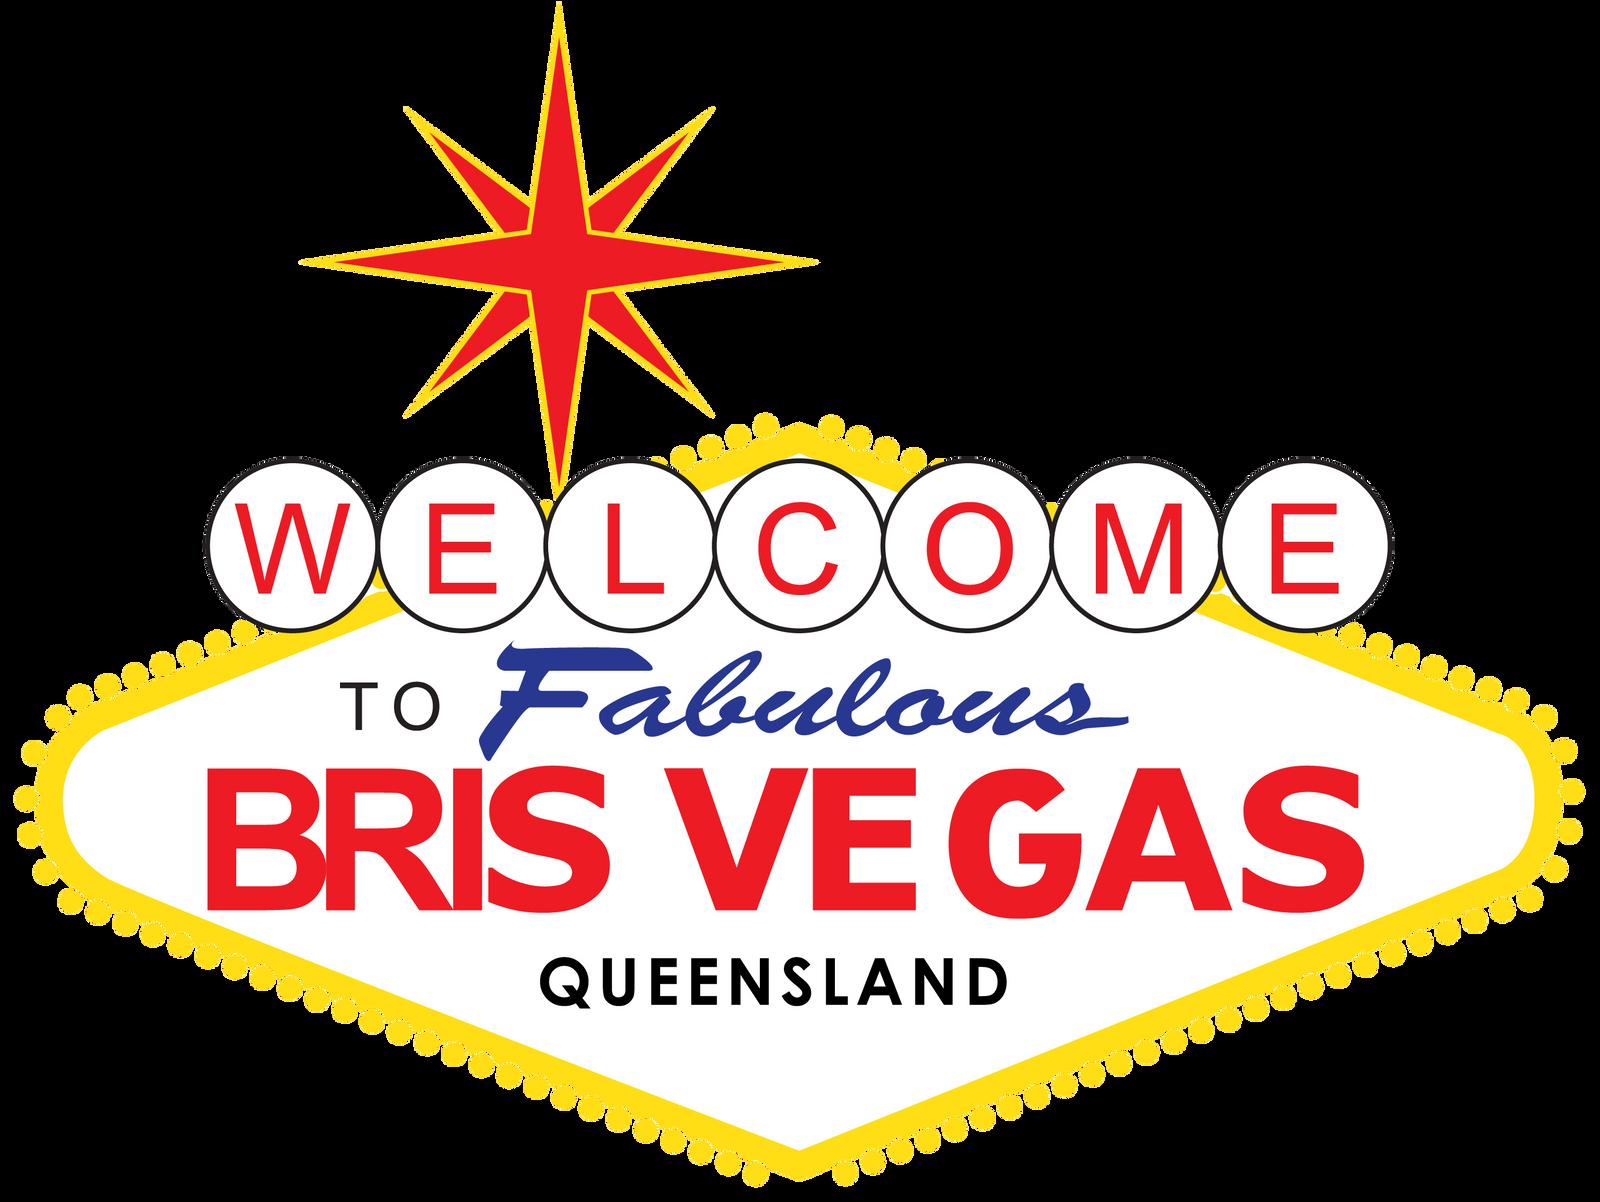 Bris Vegas Sign By Topher147 On Deviantart